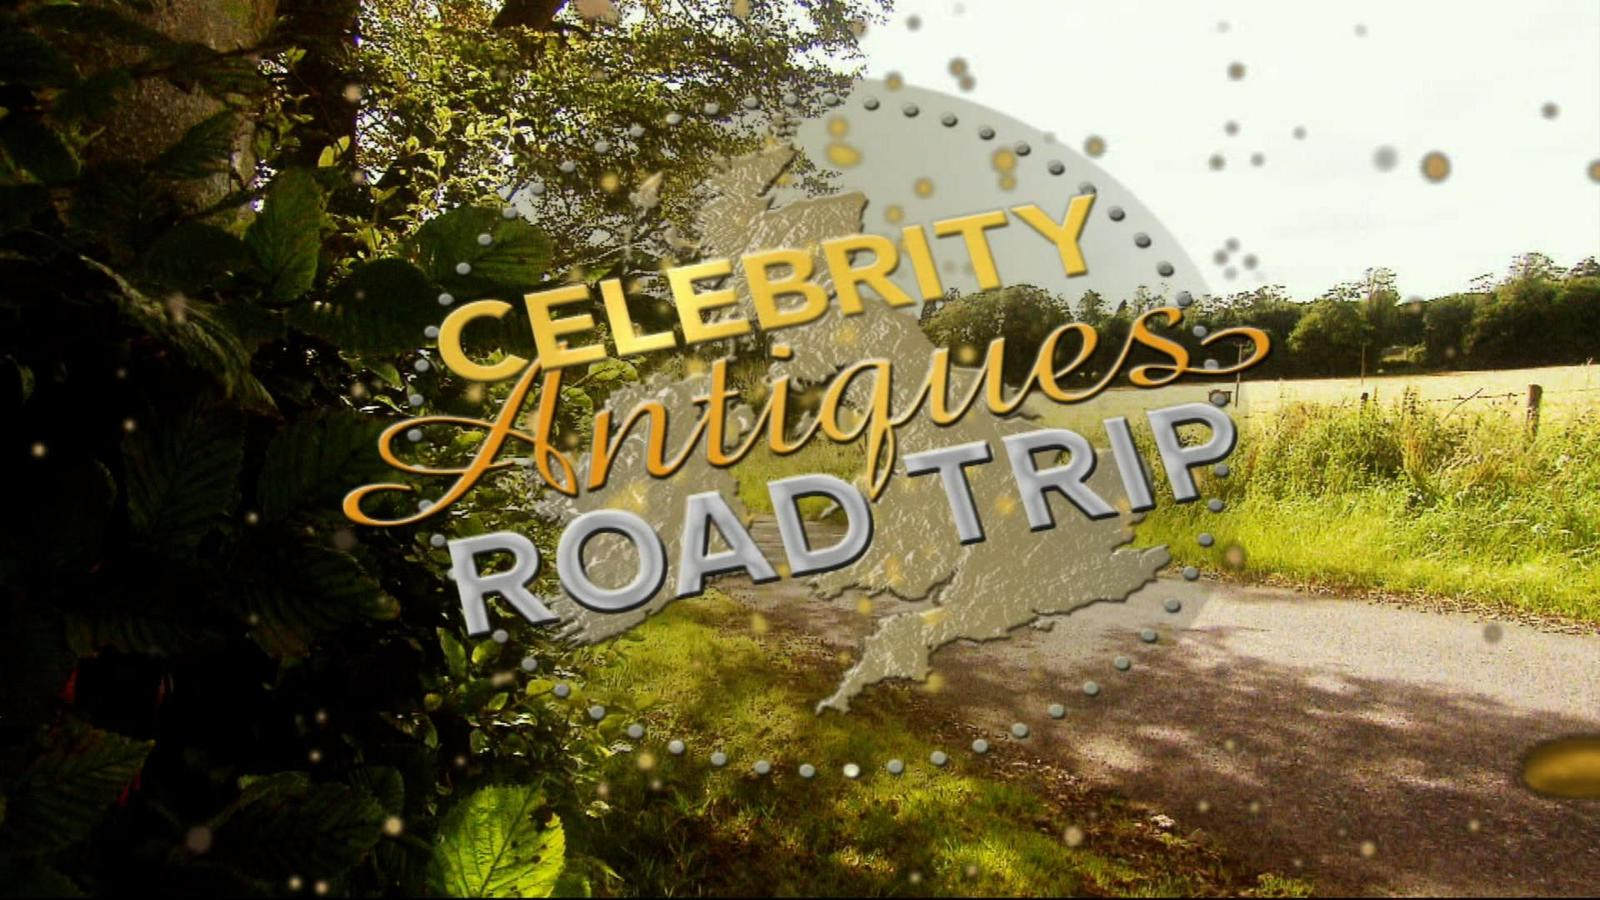 Celebrity Antiques Road Trip S07E15   Putlocker9